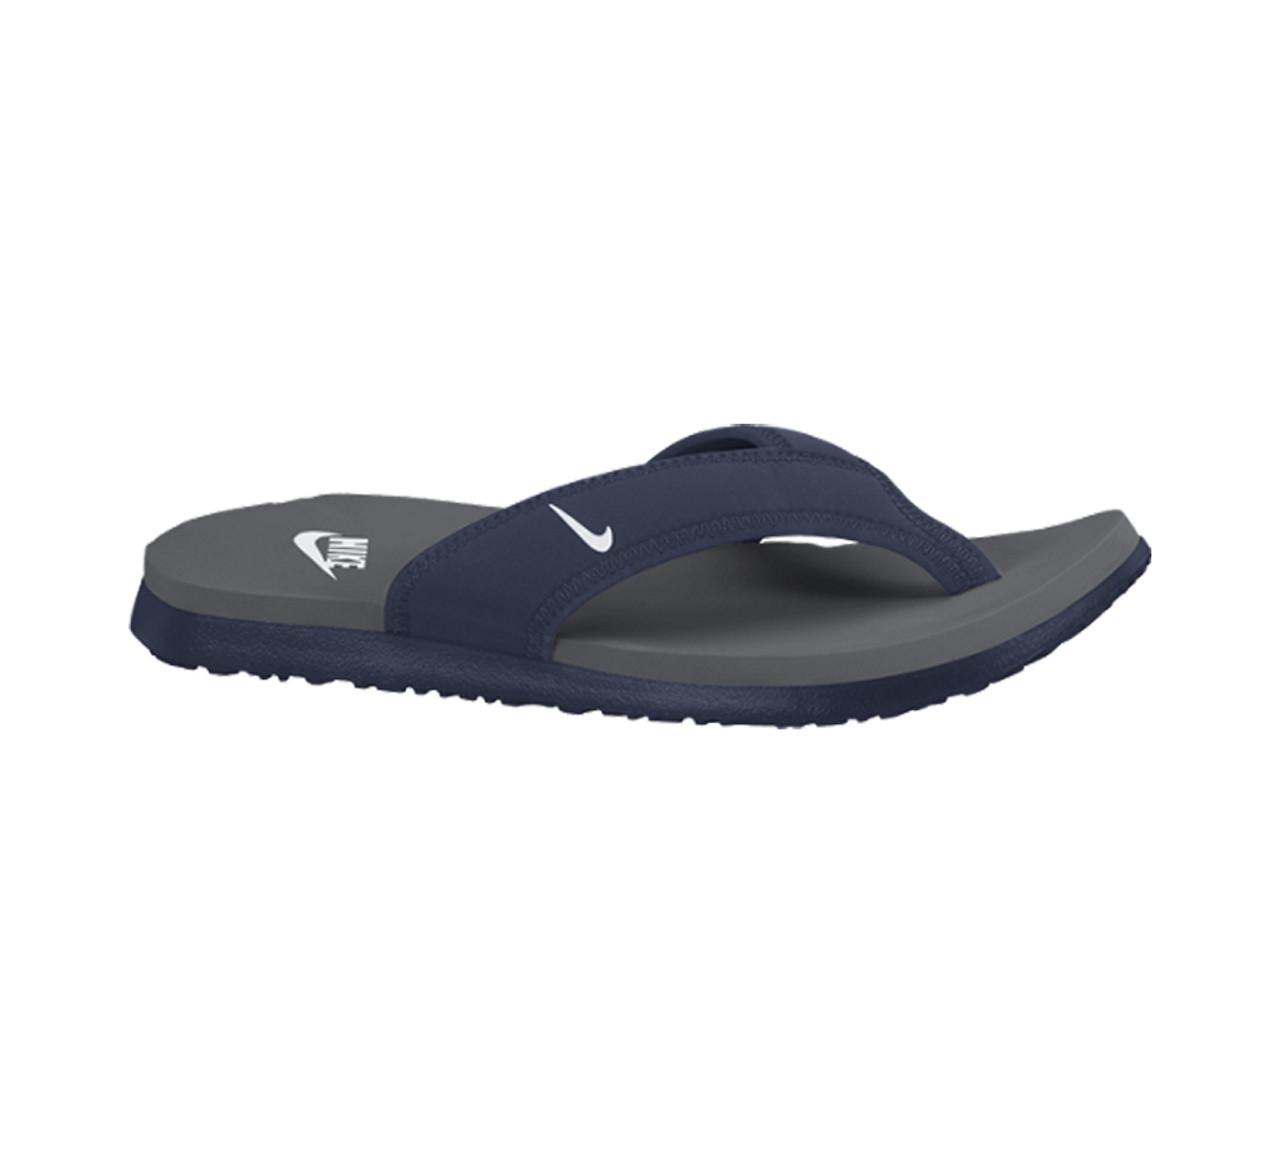 buy popular f96e0 6de03 Nike Men s Celso Thong Plus Midnight Navy White - Shop now   Shoolu.com